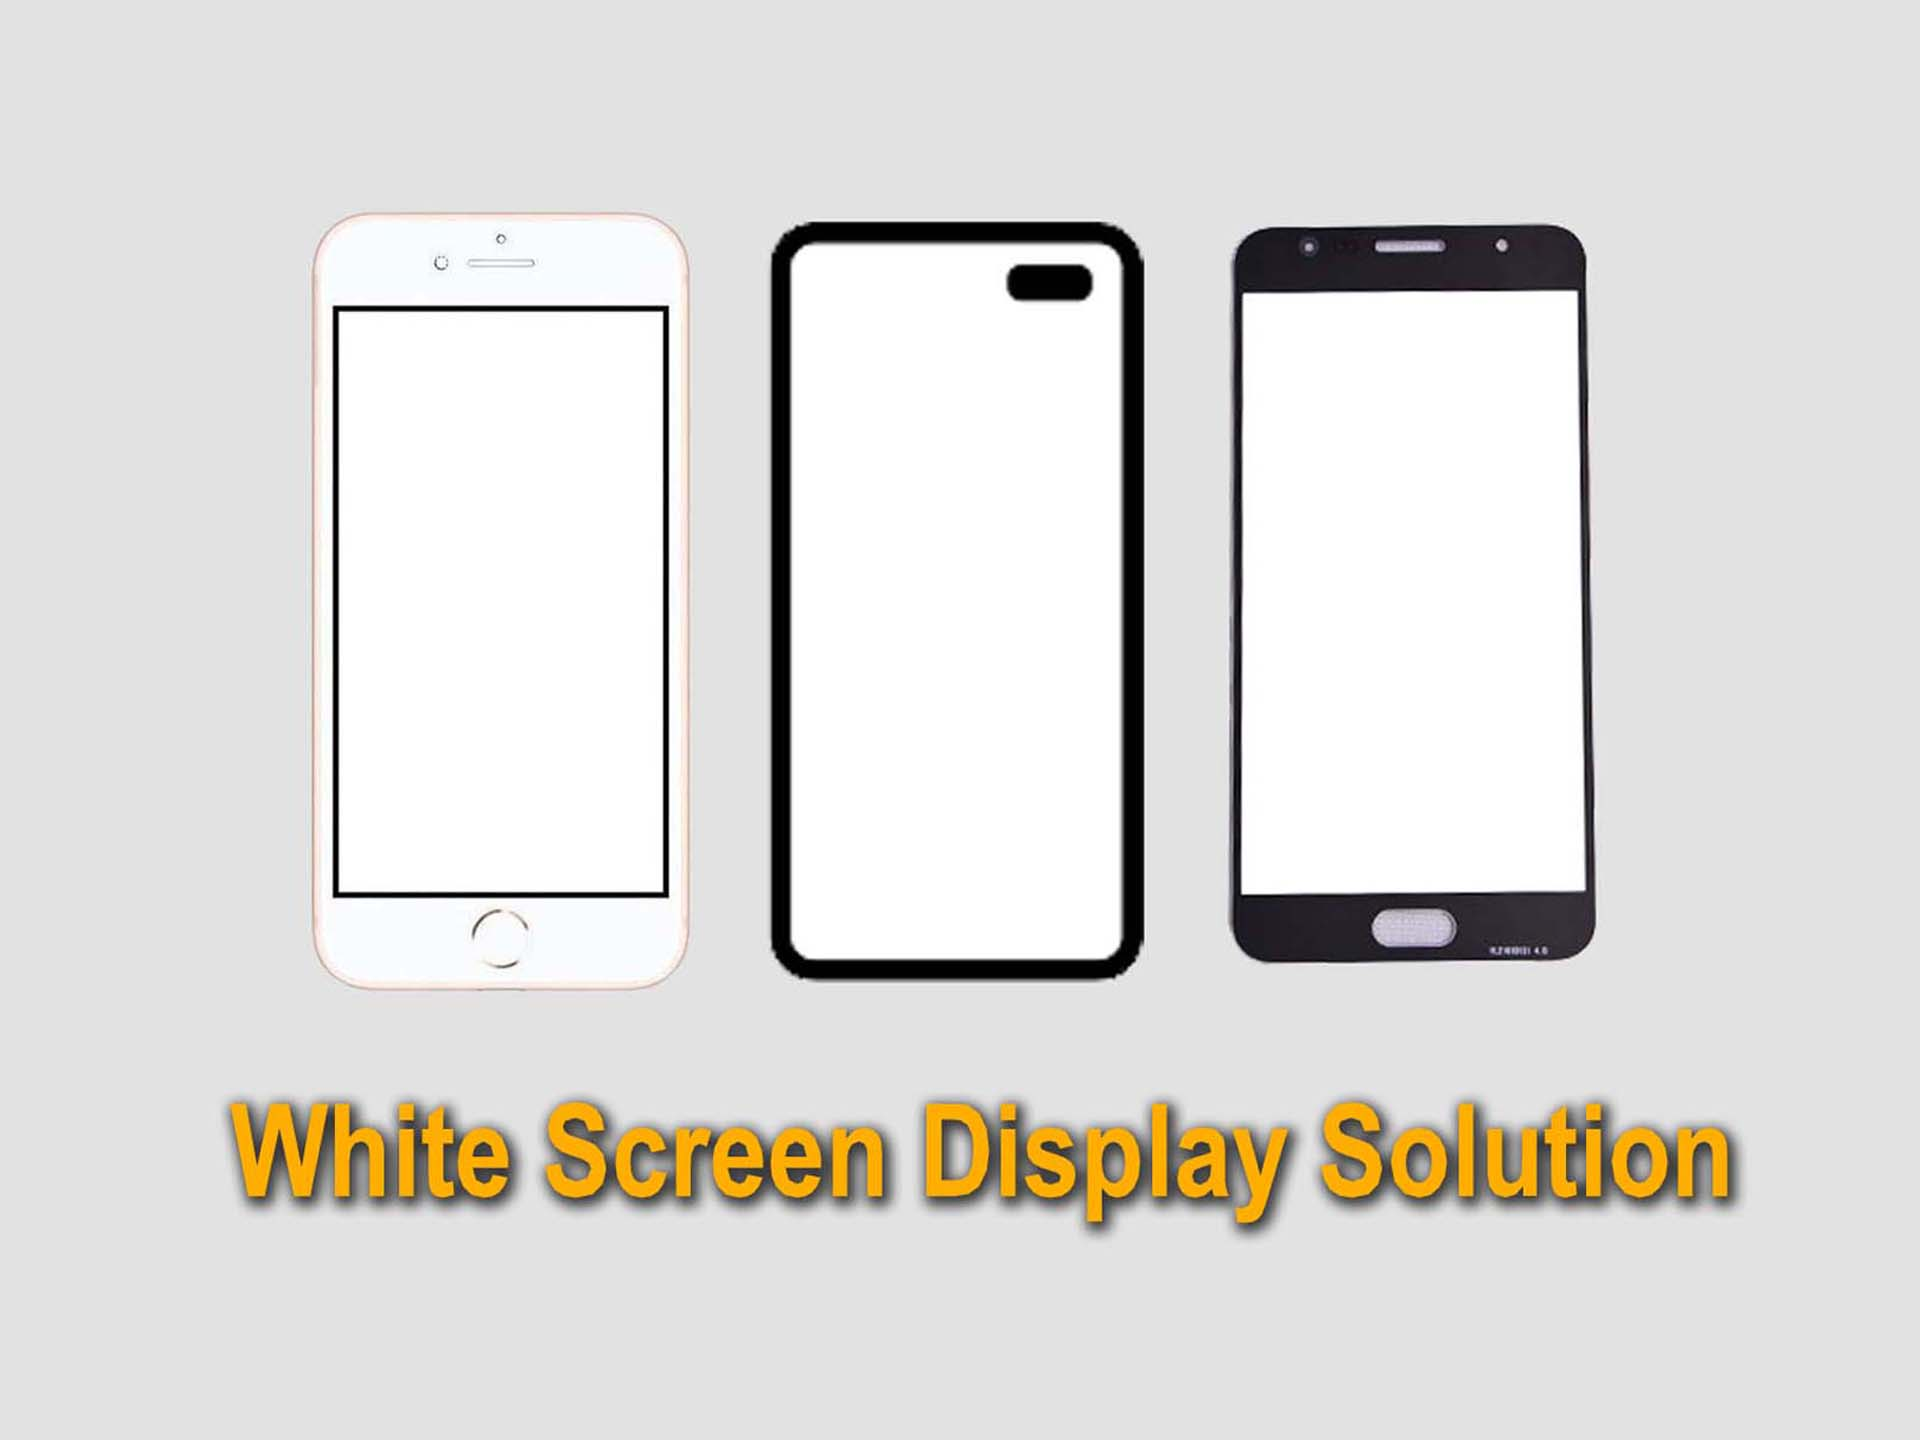 White Screen Display Repairing মোবাইলের ডিসপ্লে সাদা